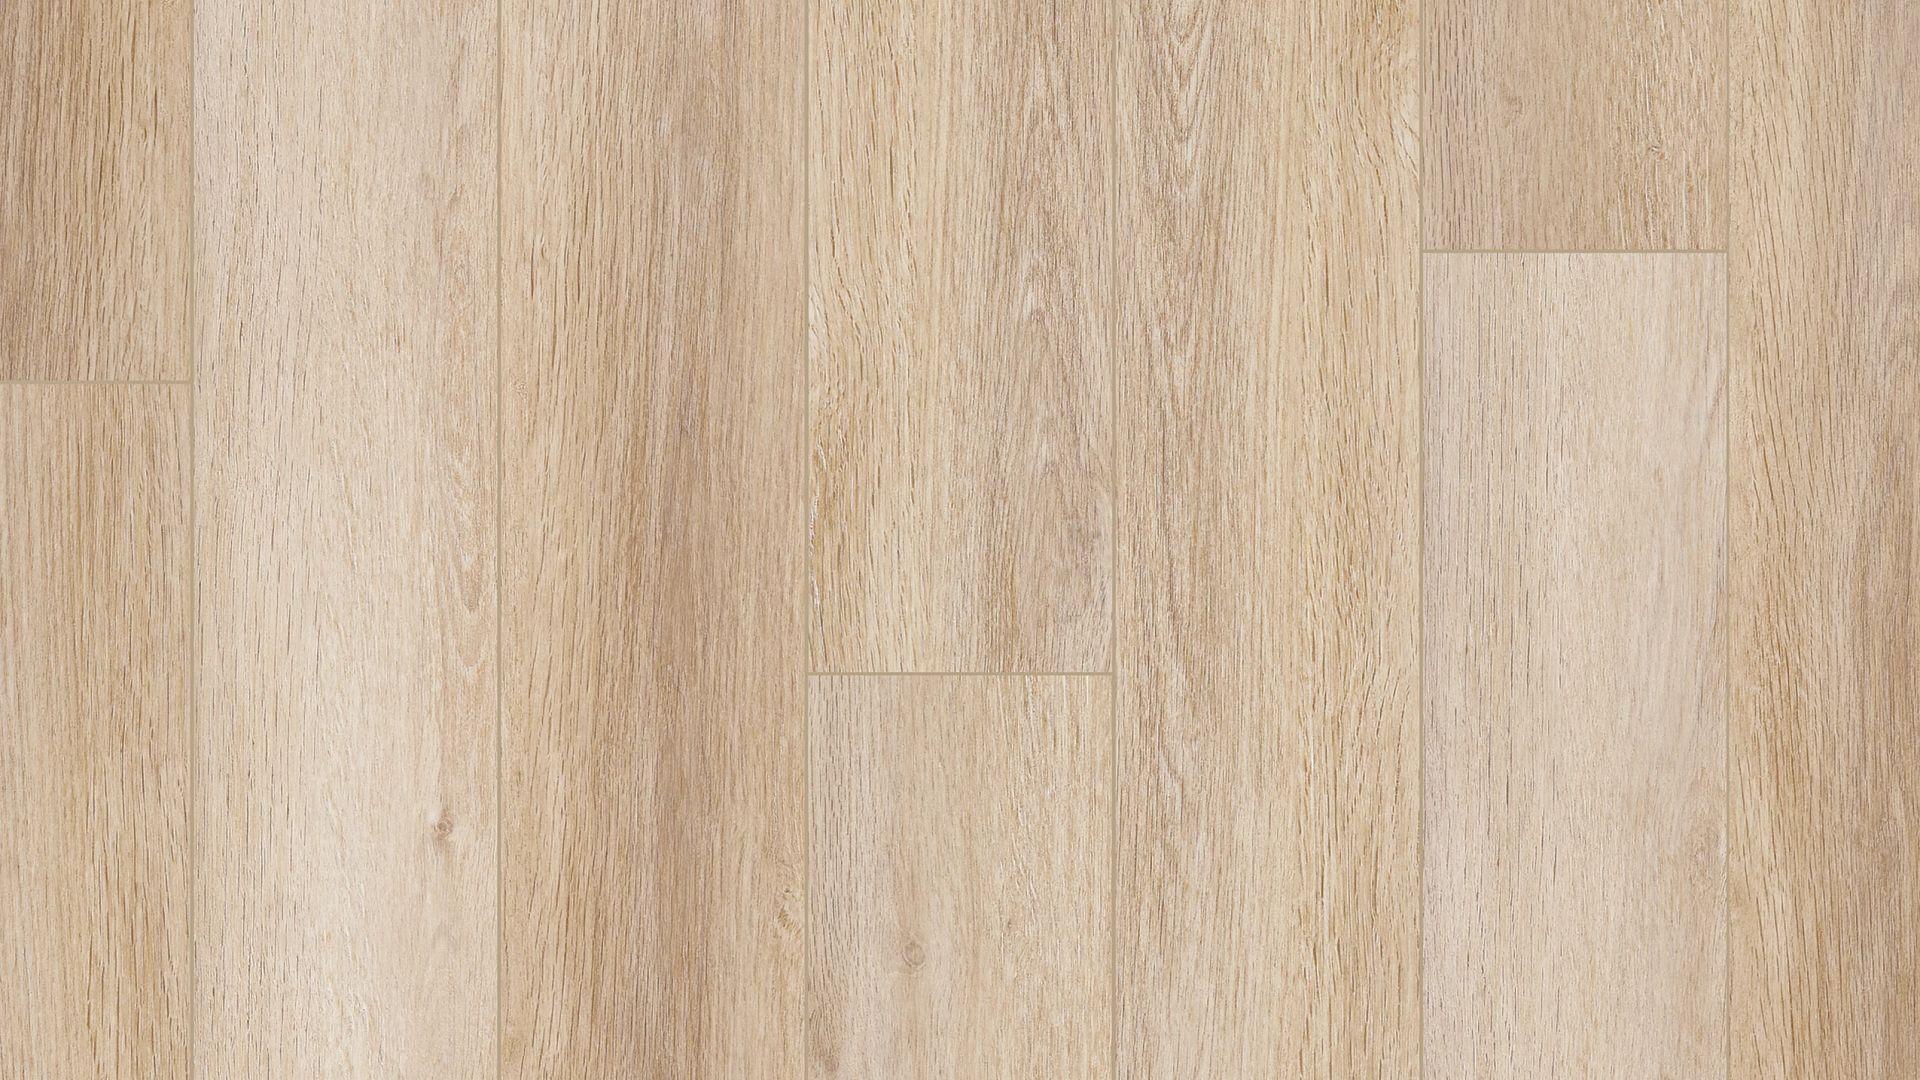 Aldergrove Oak EVP Vinyl Flooring Product Shot